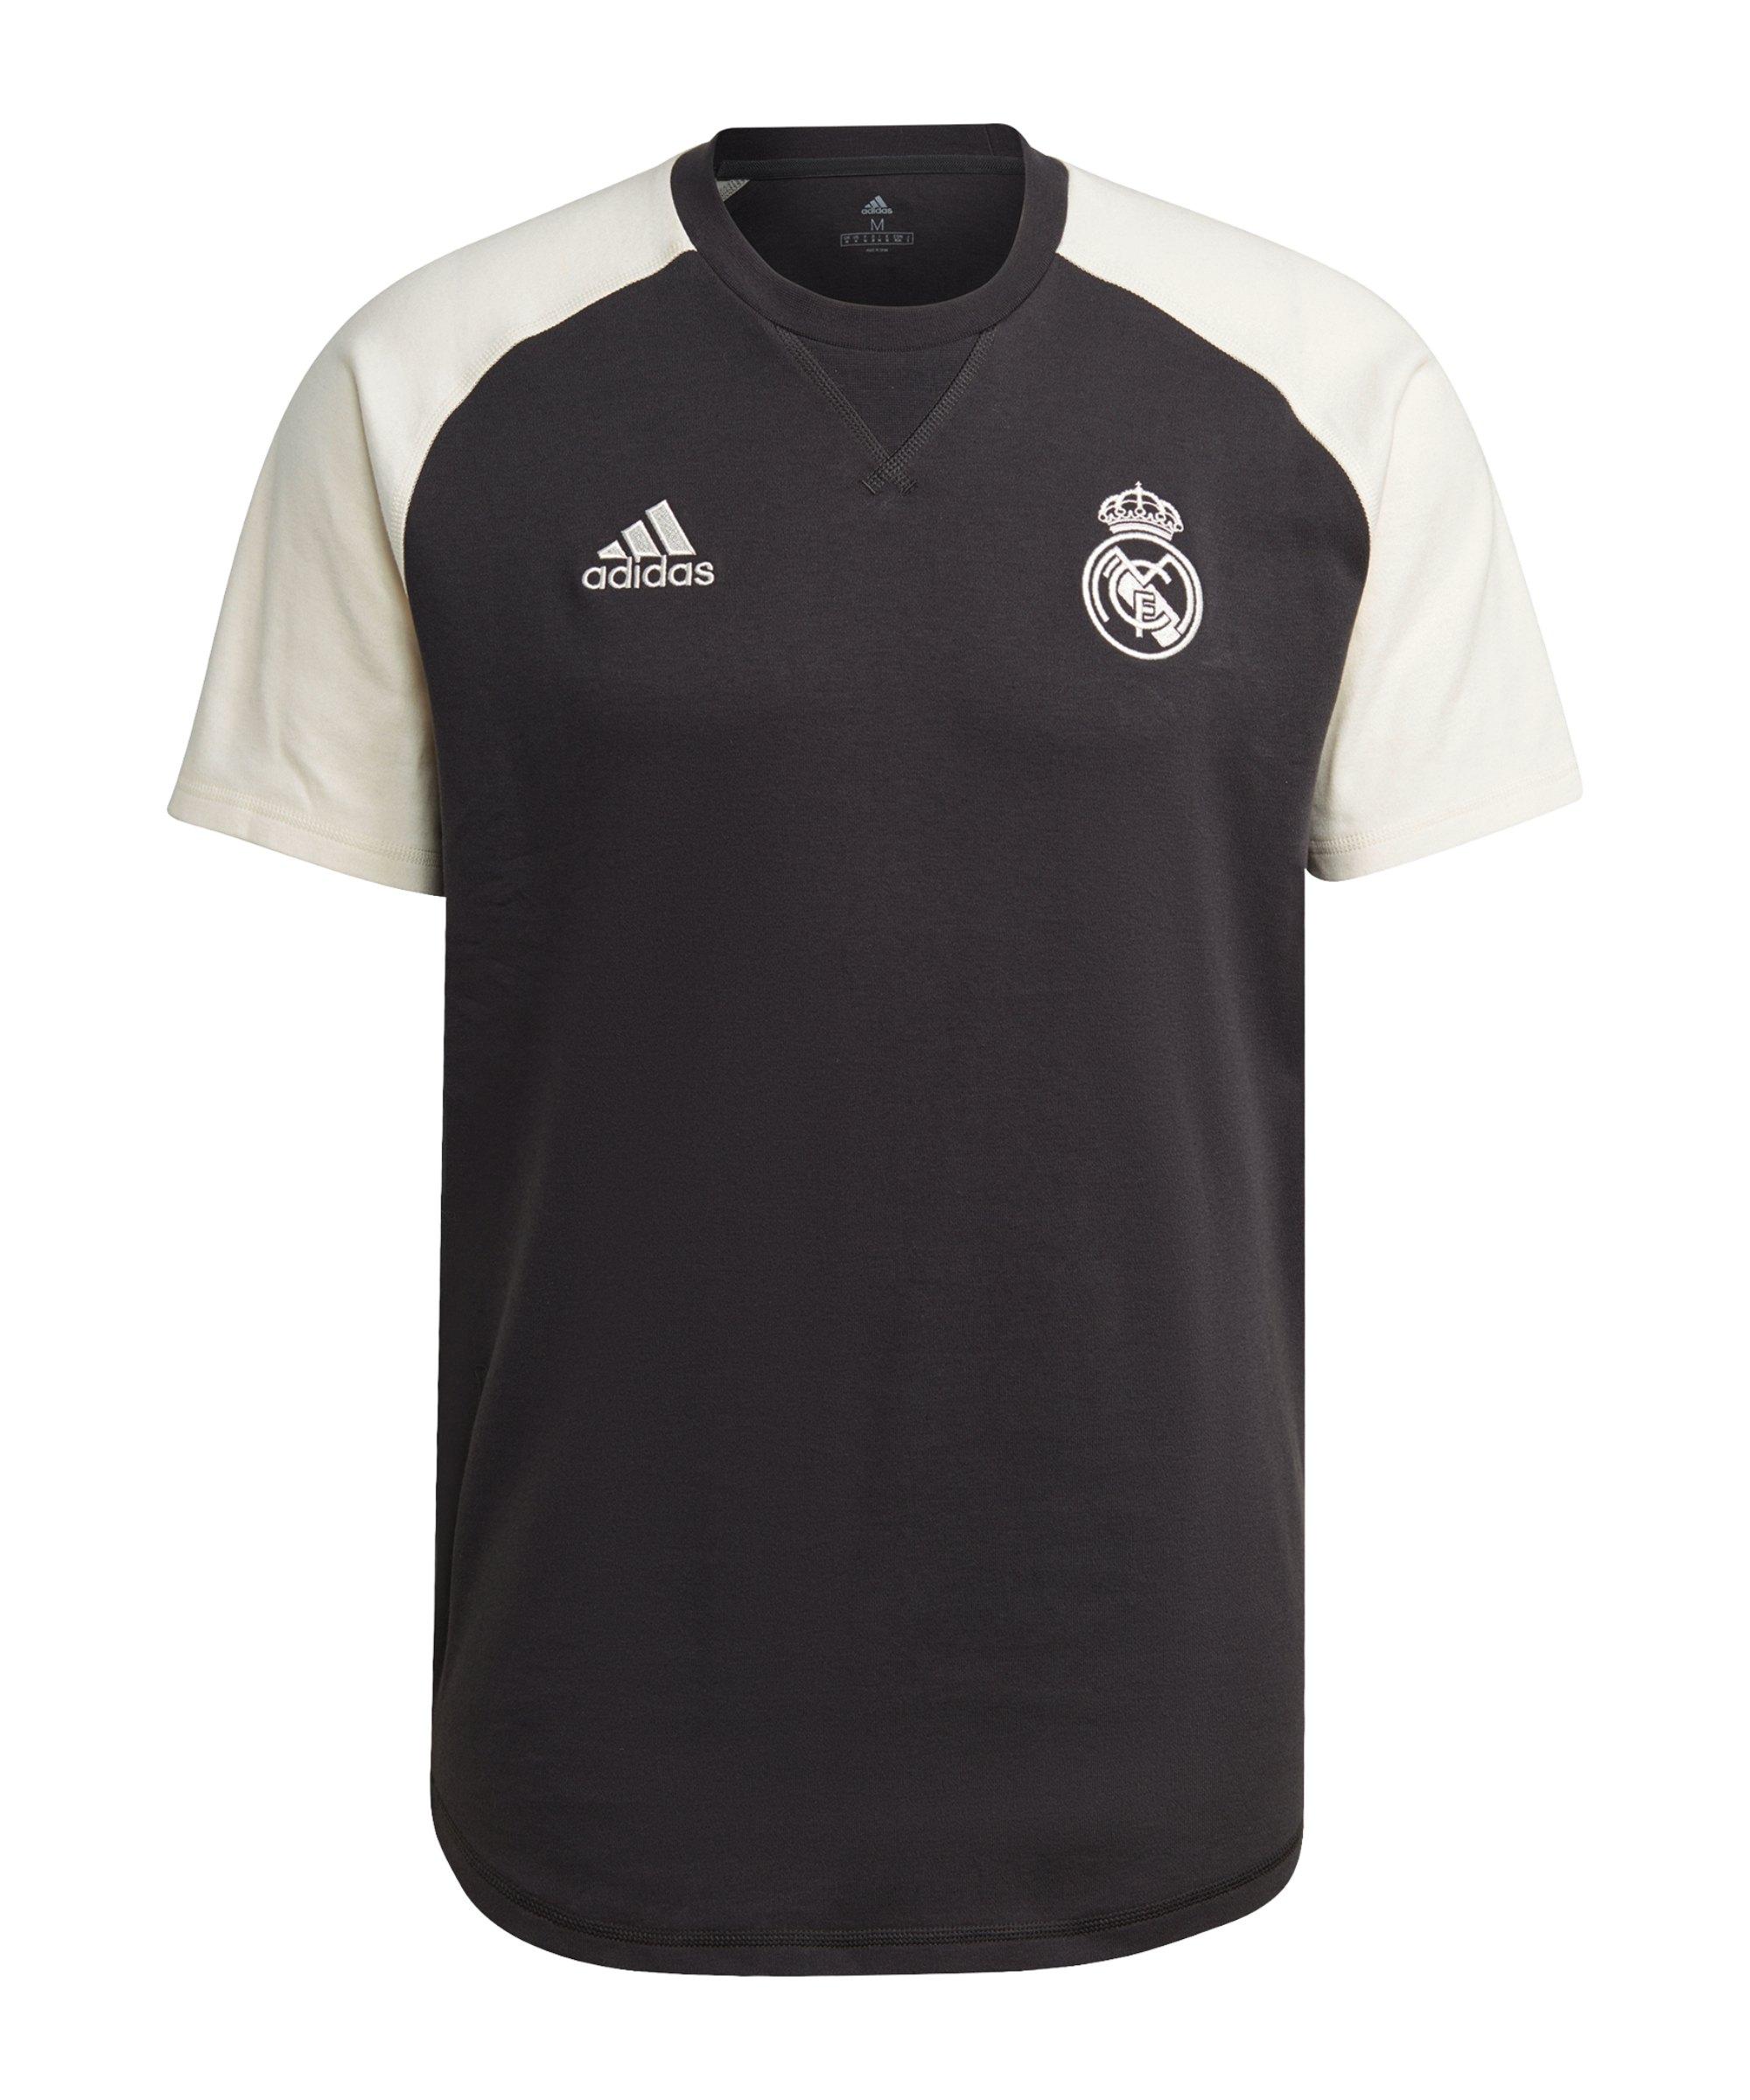 adidas Real Madrid T-Shirt Schwarz - schwarz